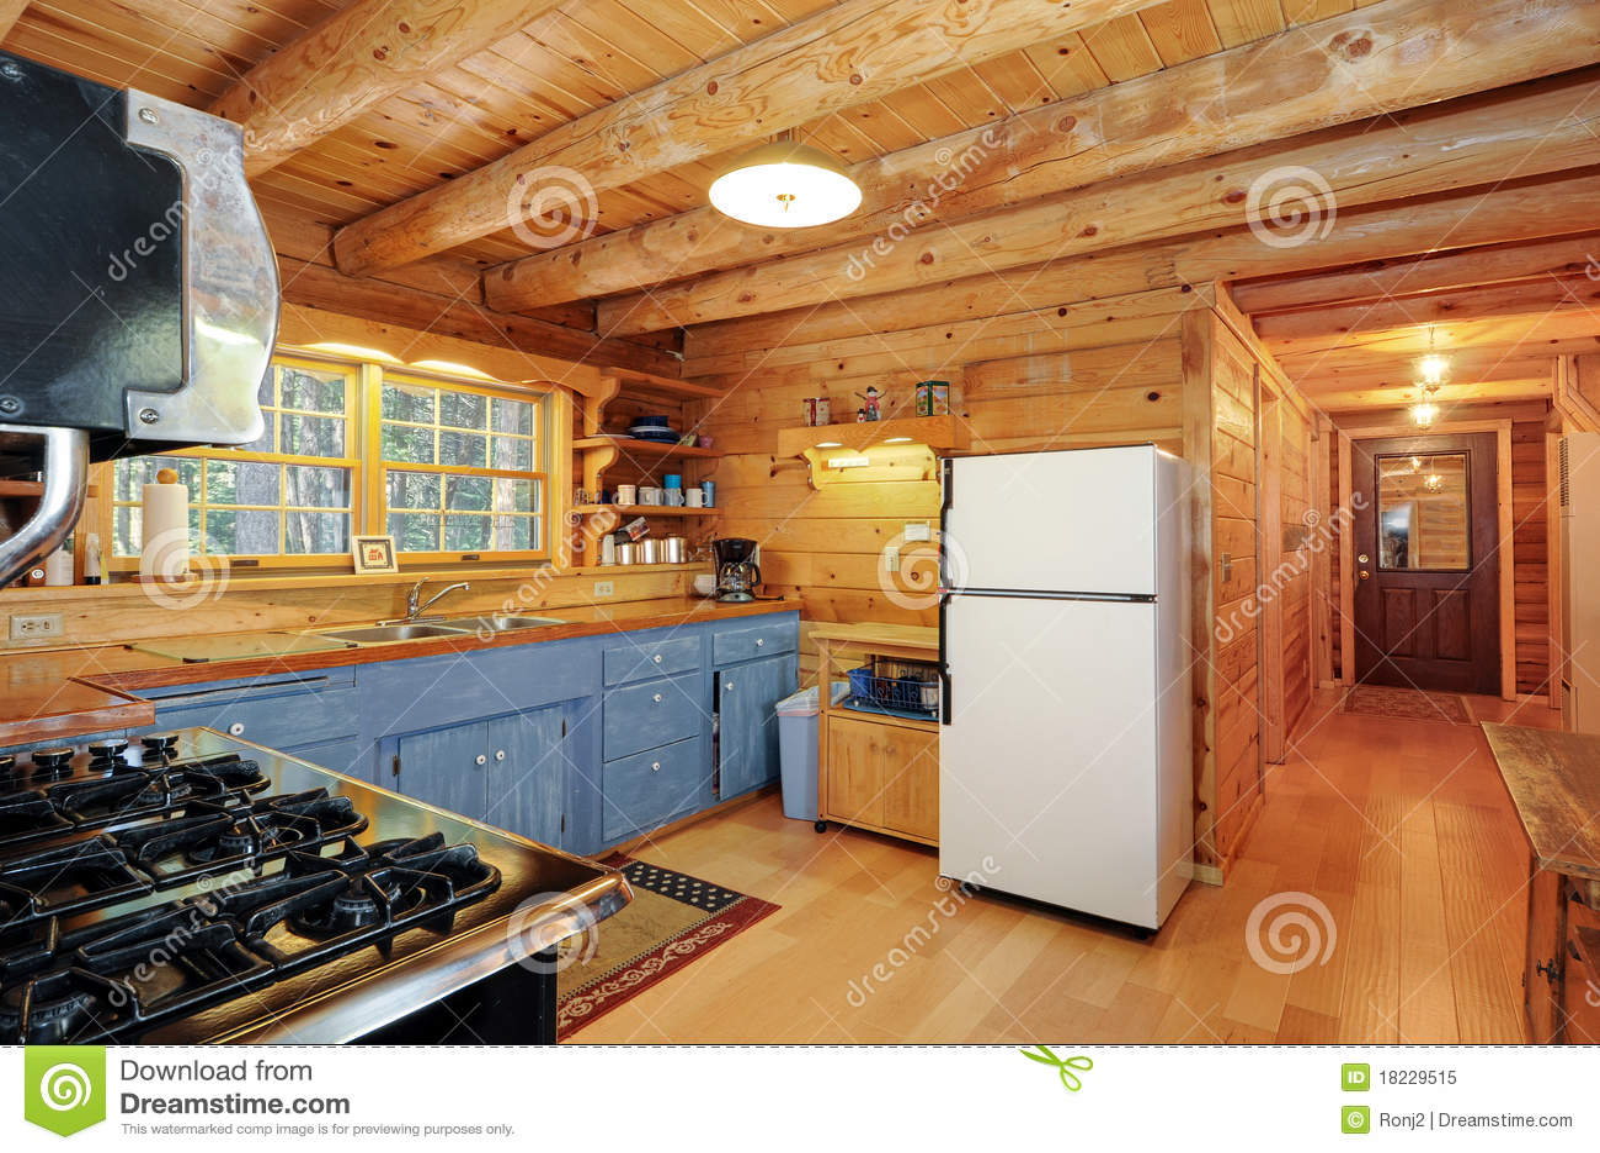 Log House Kitchen Royalty Free Stock Photo Image 18229515